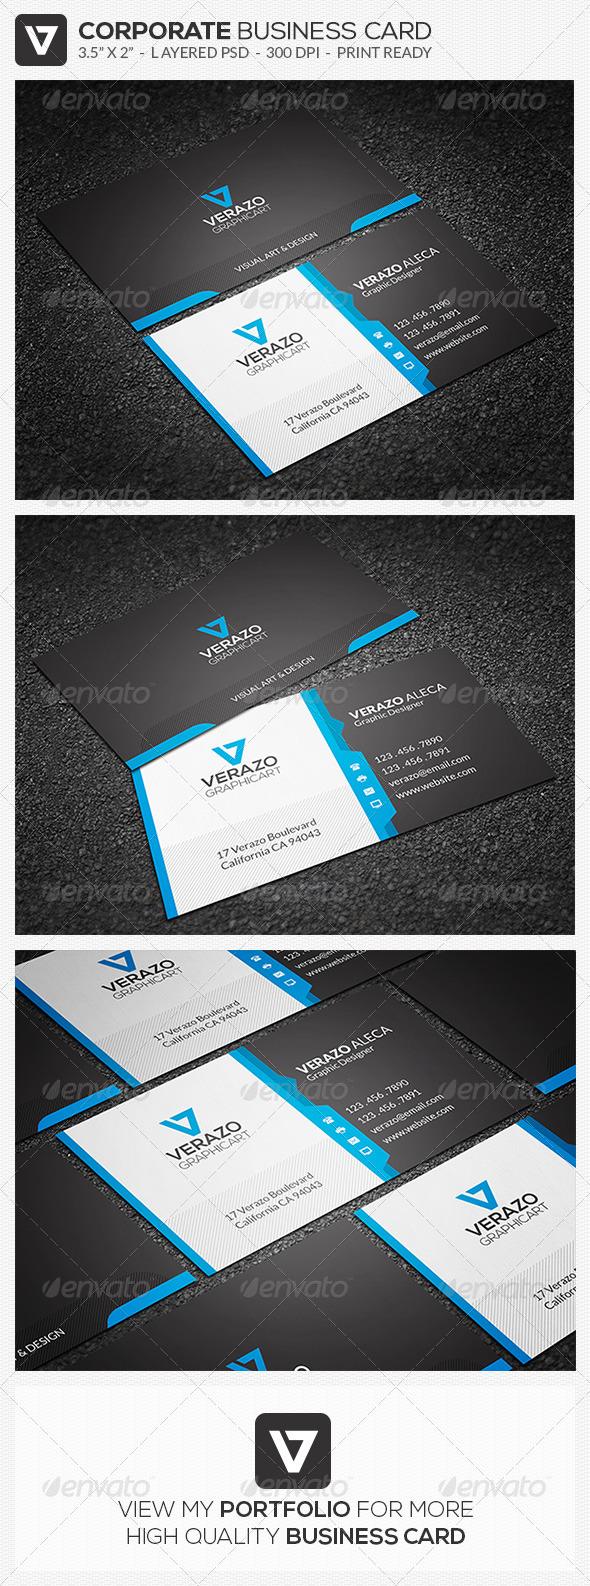 GraphicRiver Creative Corporate Business Card 45 8183184